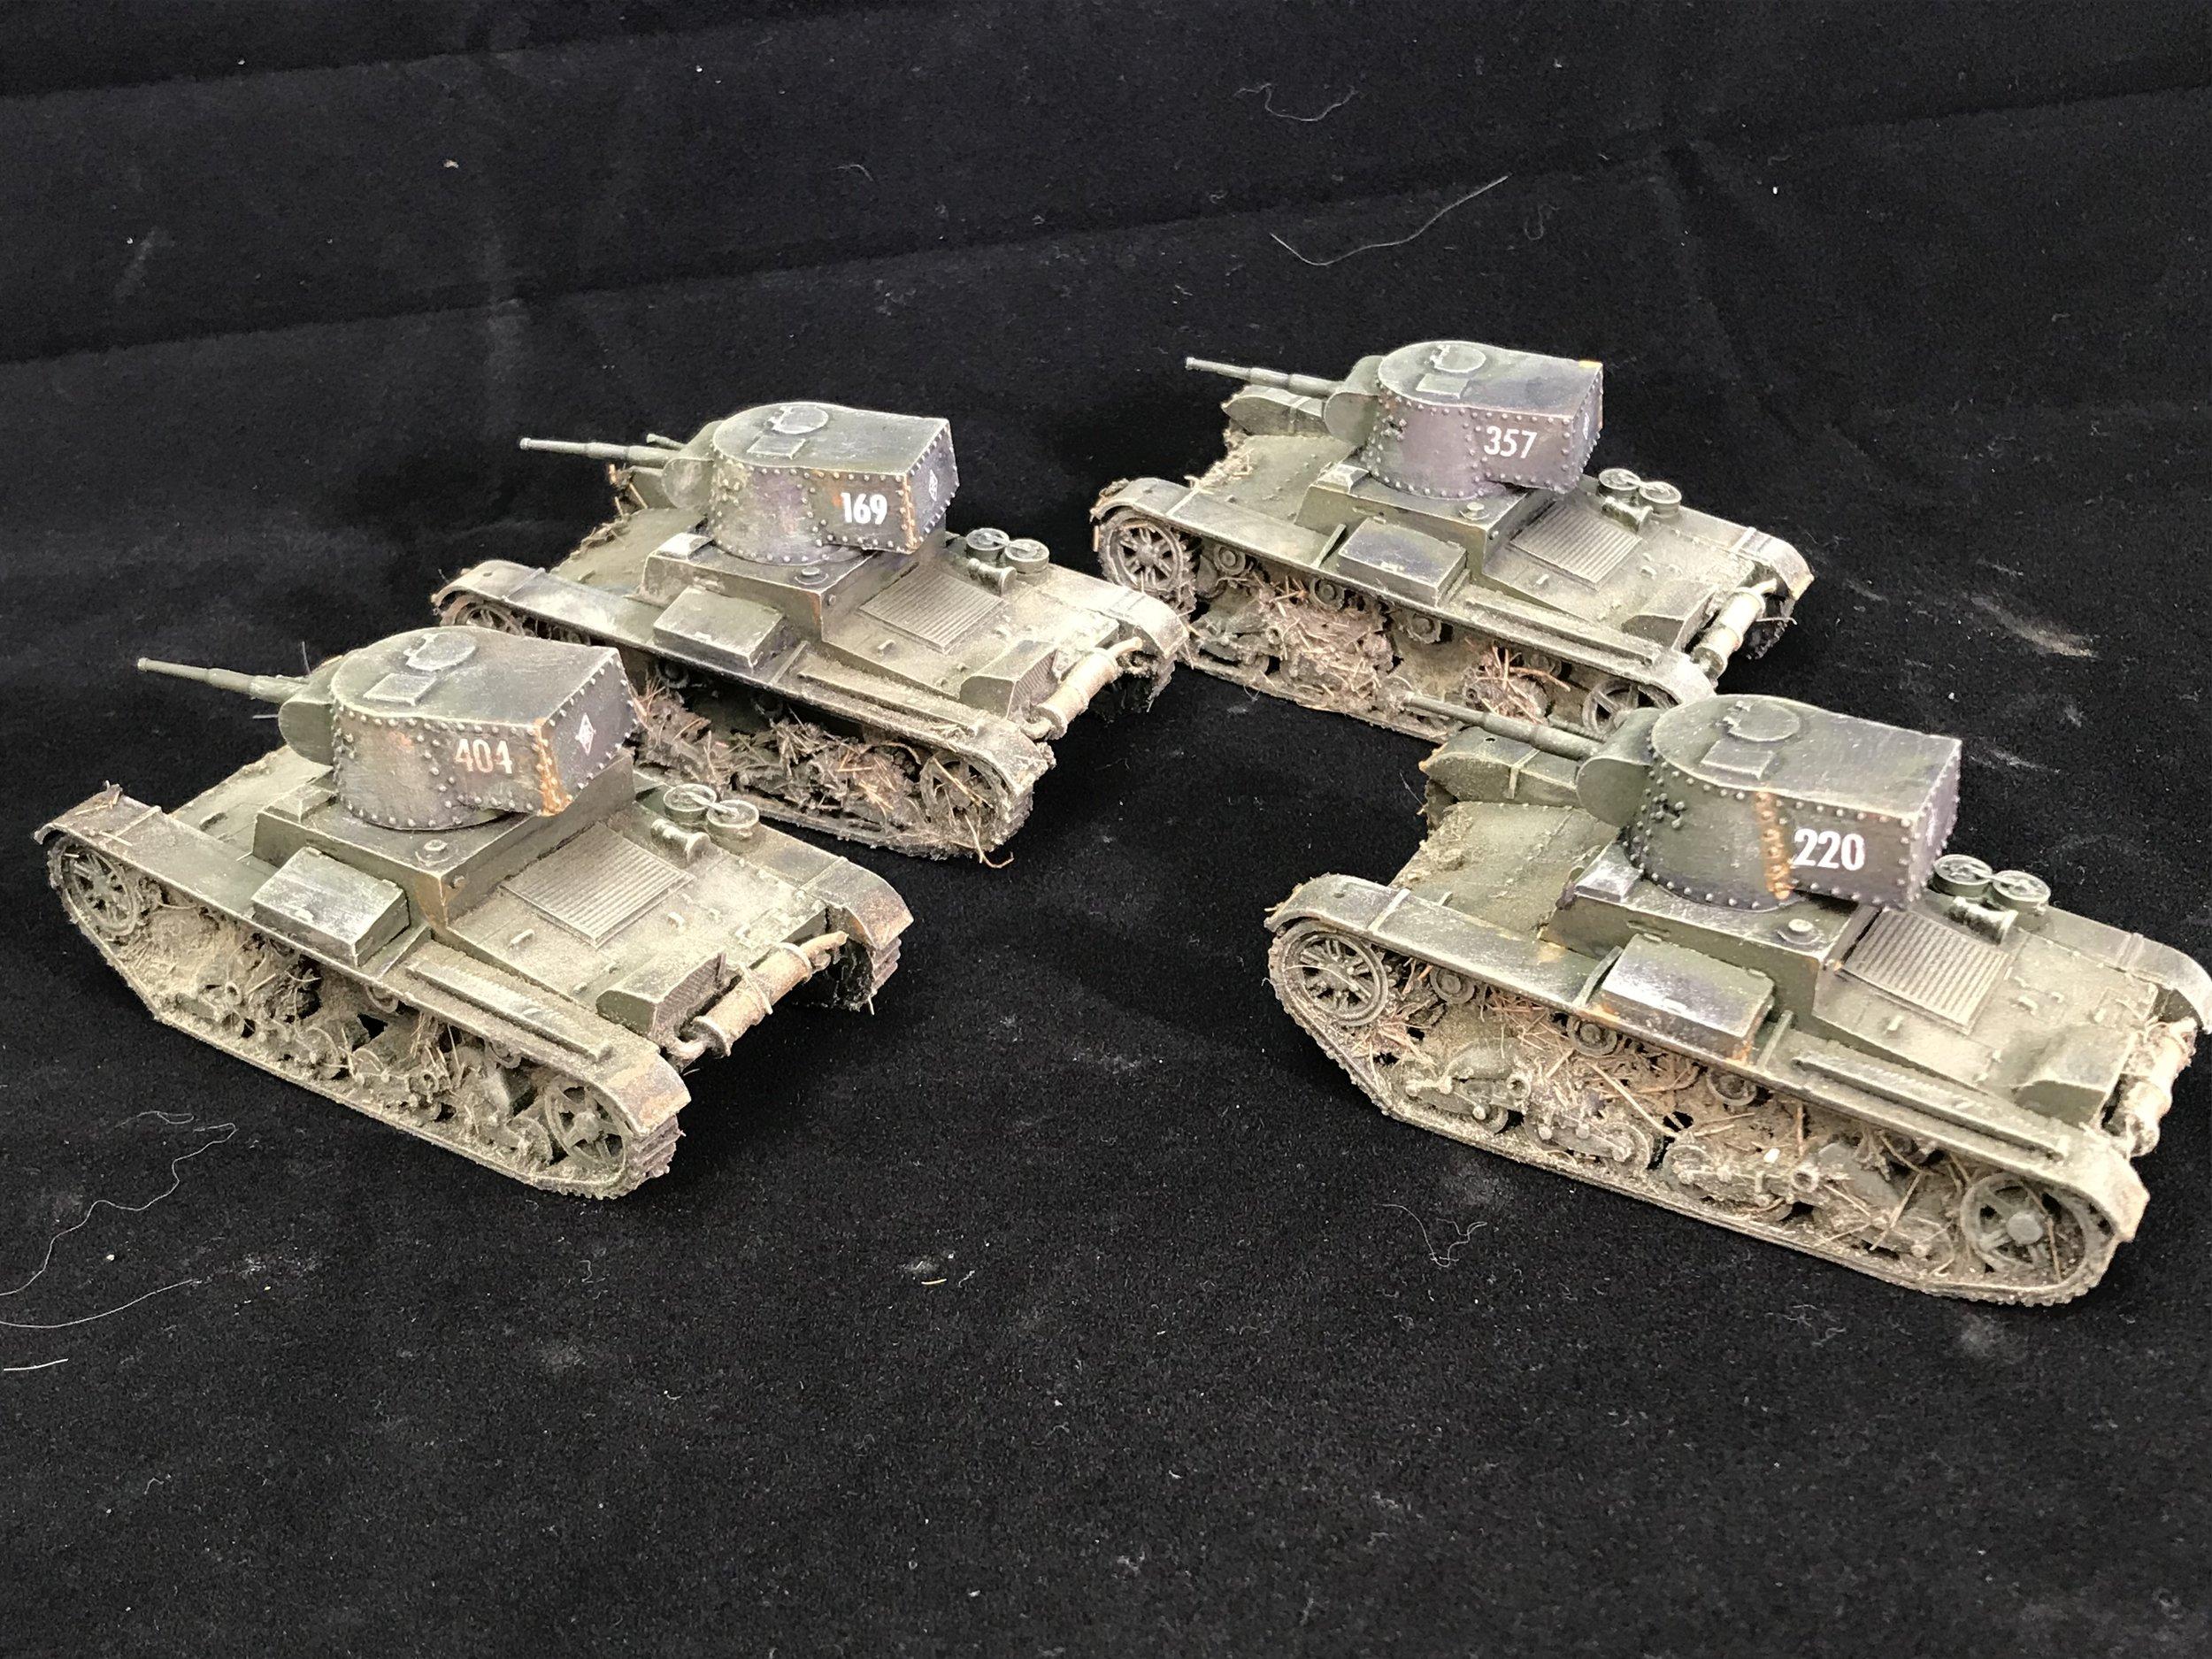 Chris' T-26 Soviet Tanks